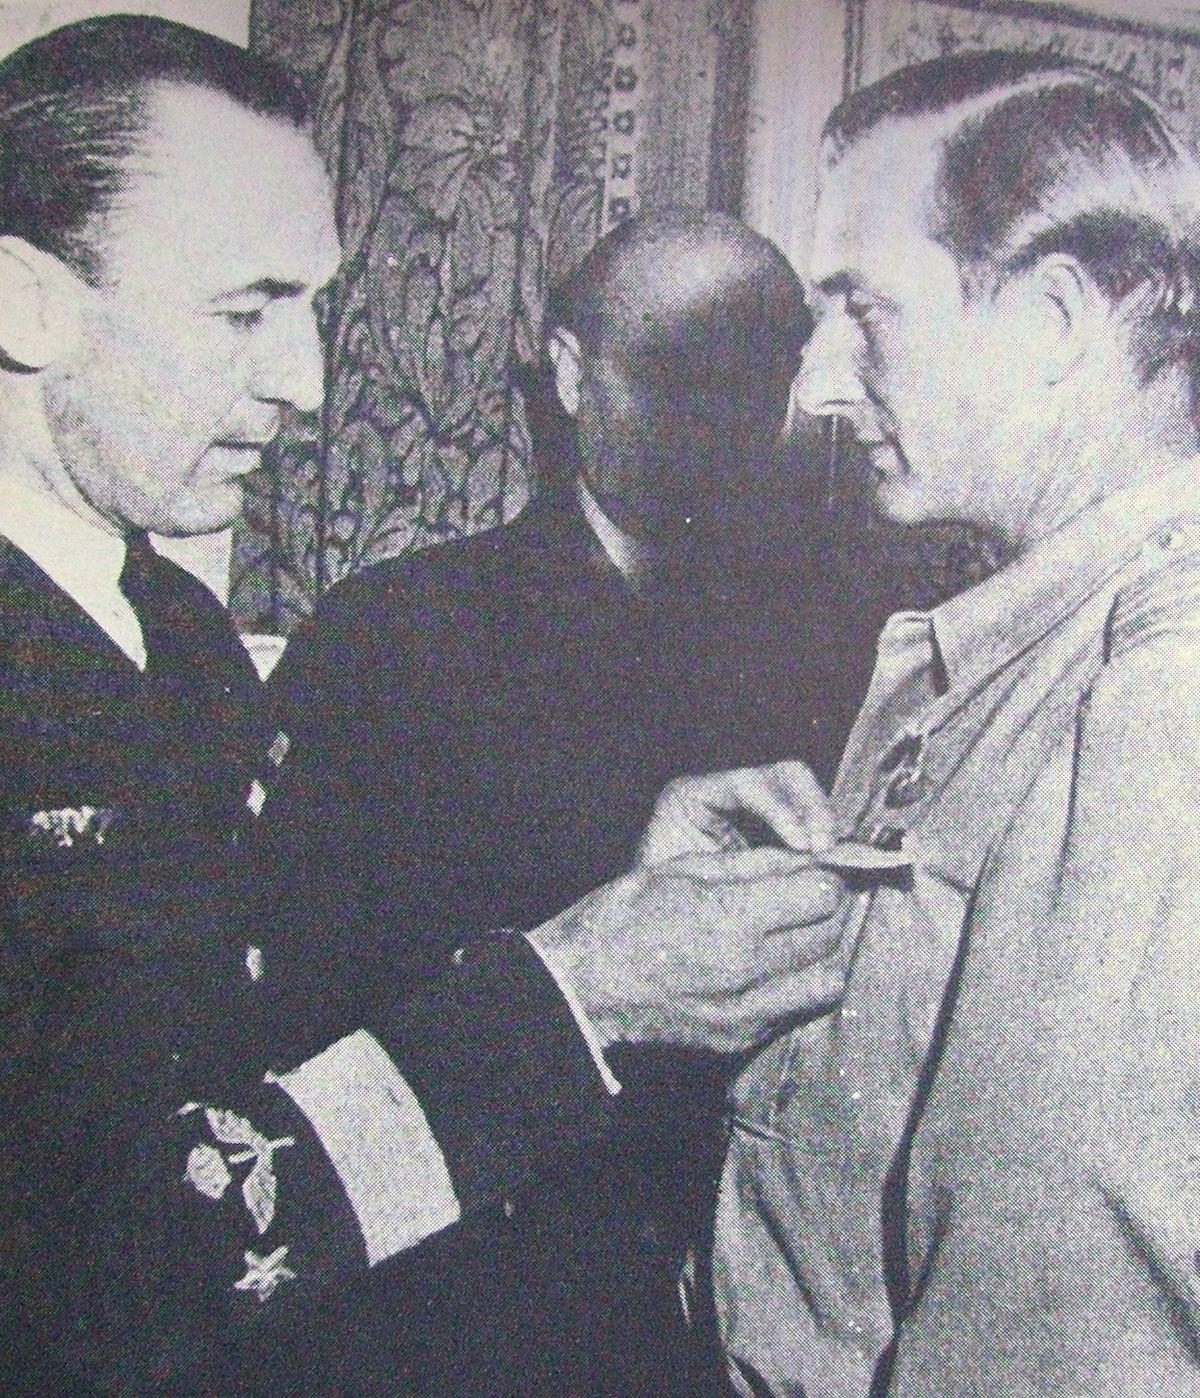 Bengt Nordenskiöld o Carl Gustaf von Rosen.JPG